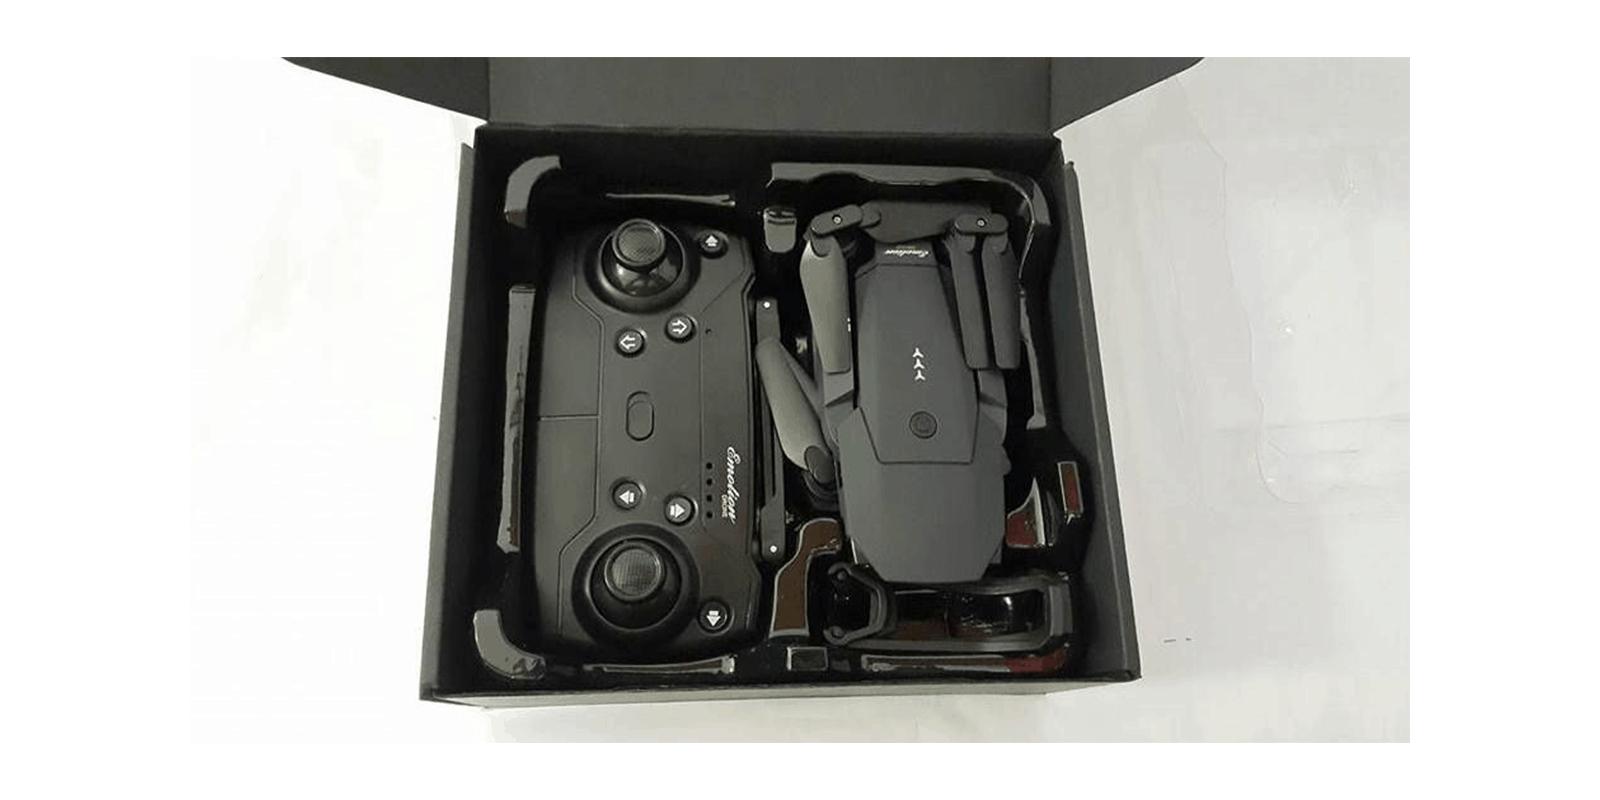 DroneX Pro specifications